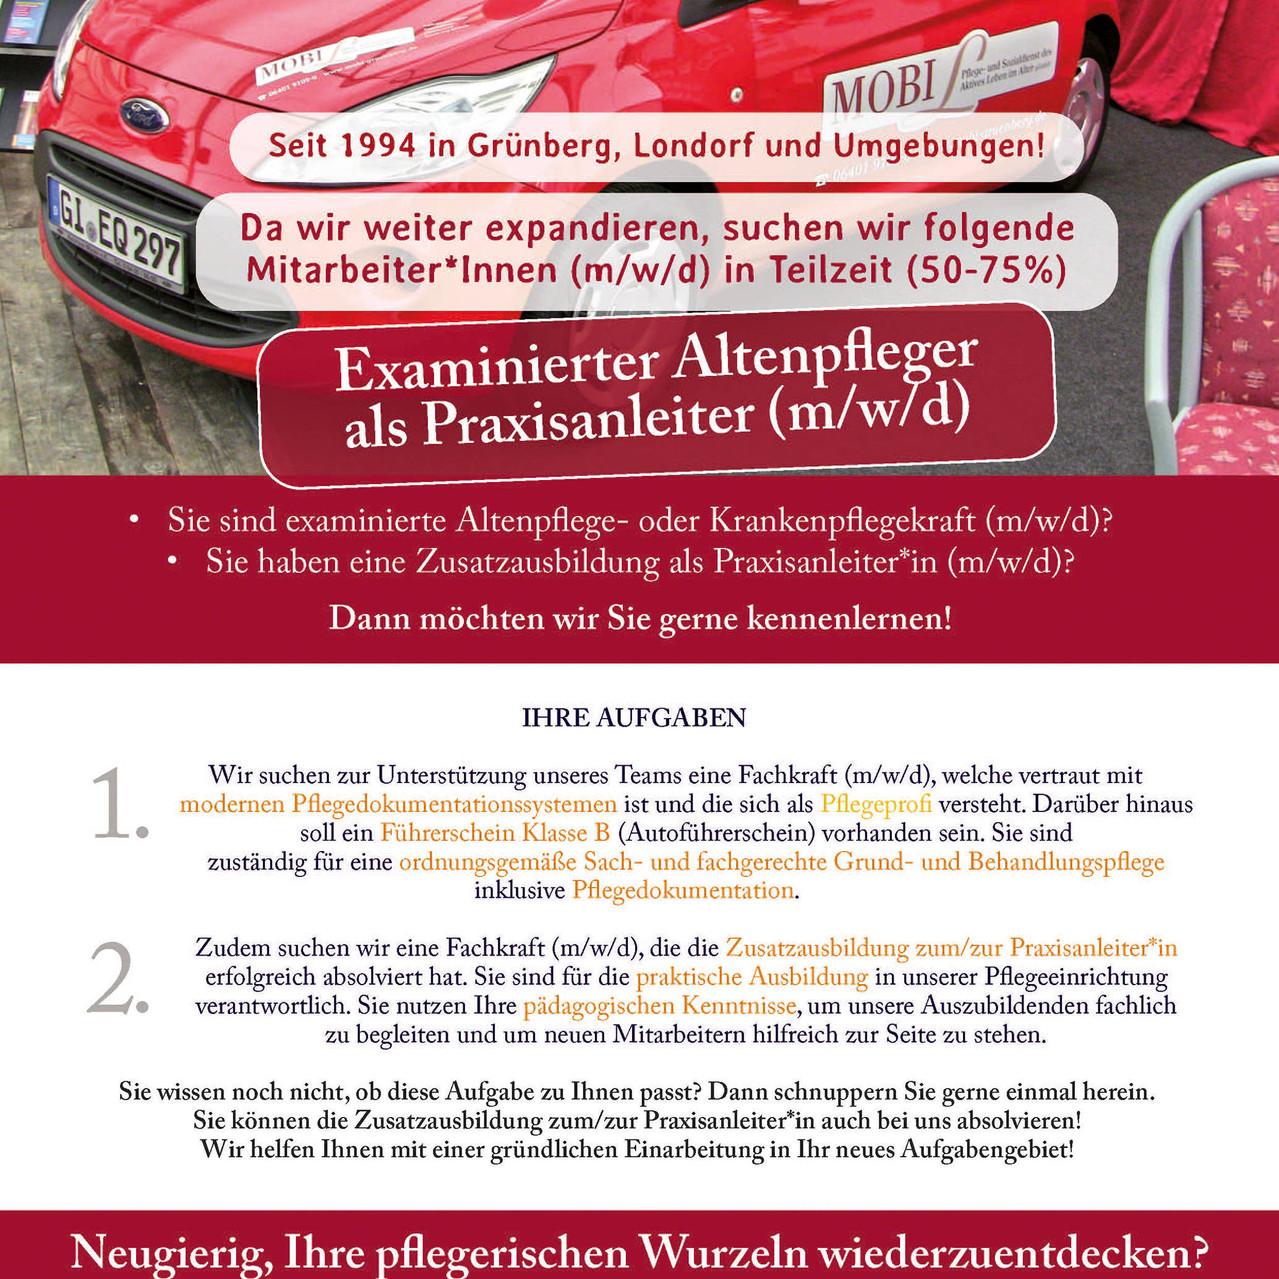 MOBI_Praxisanleiter_062019_web